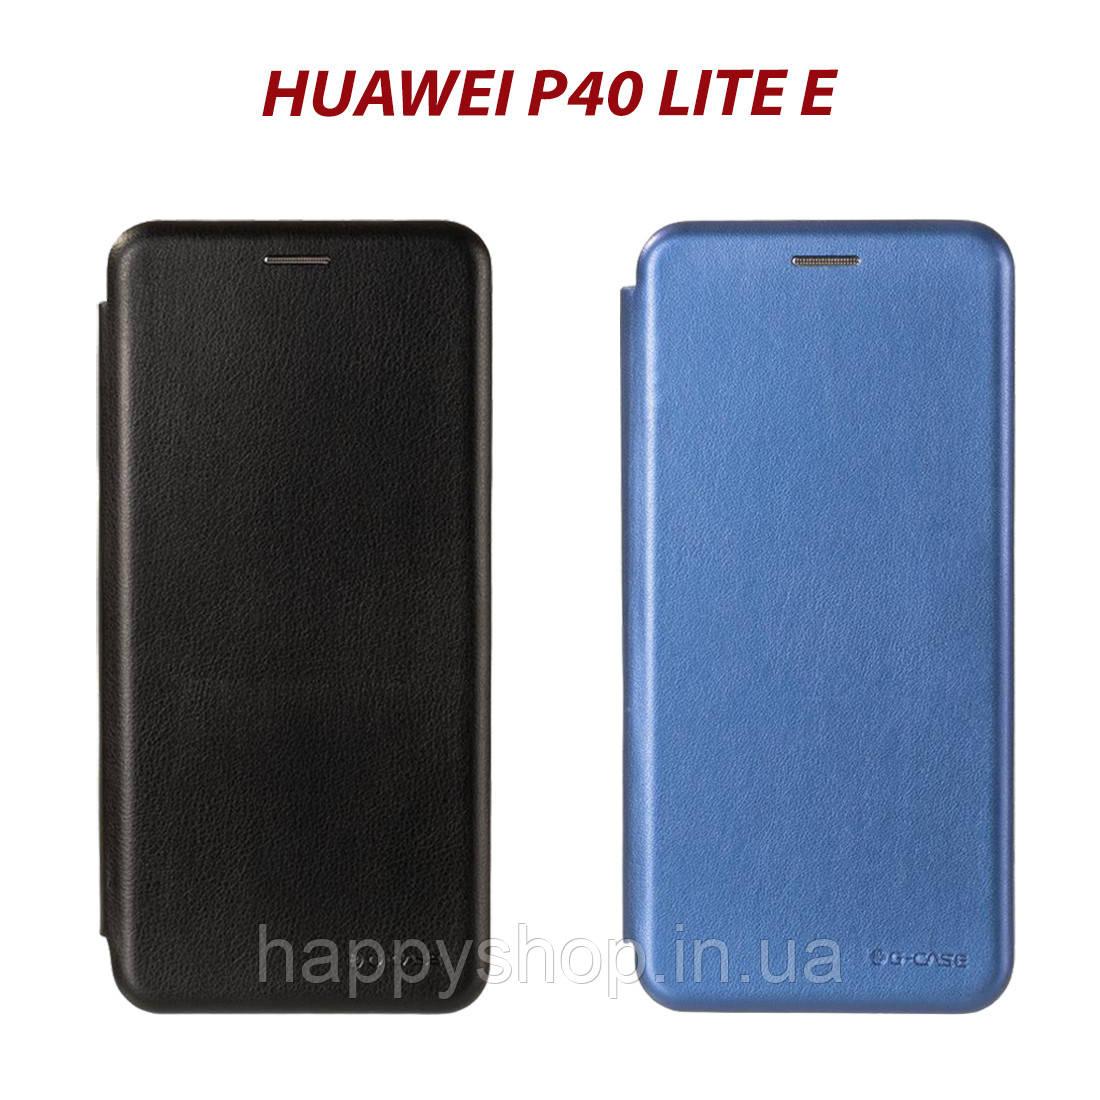 Чохол-книжка G-Case для Huawei P40 Lite E